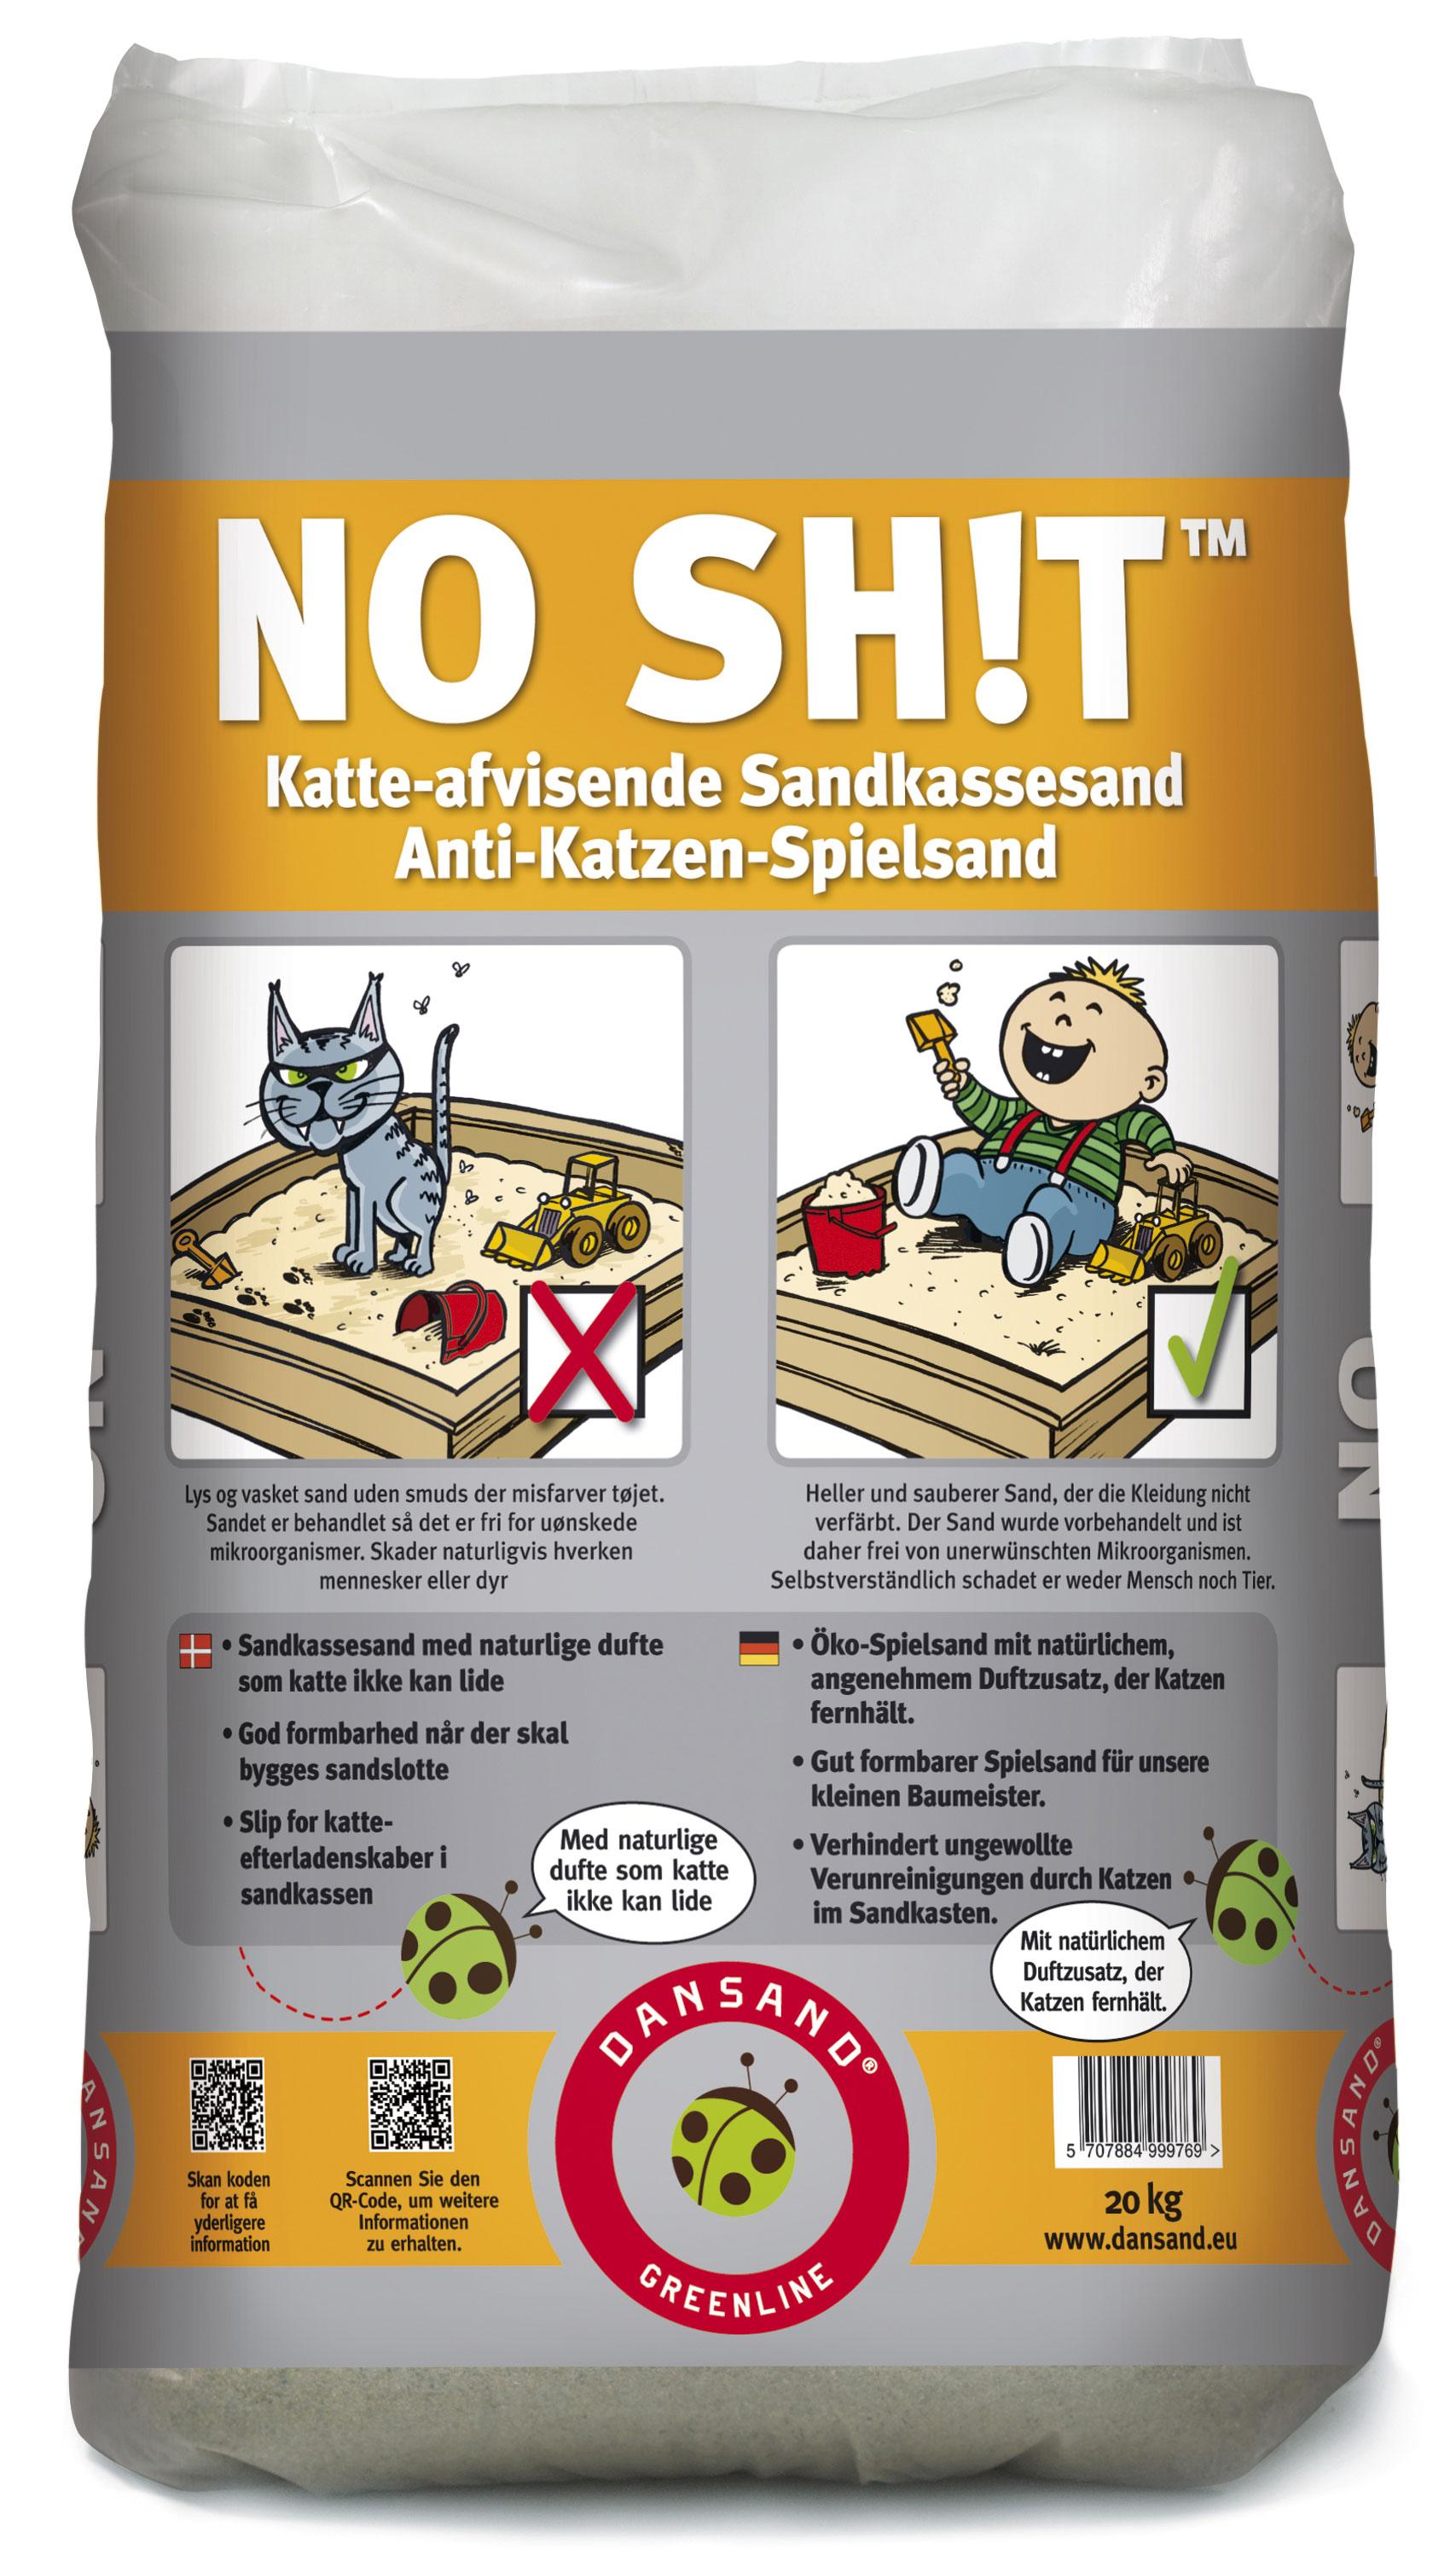 Spielsand NO SHIT  Anti-Katzen-Spielsand Dansand 20 kg Bild 1